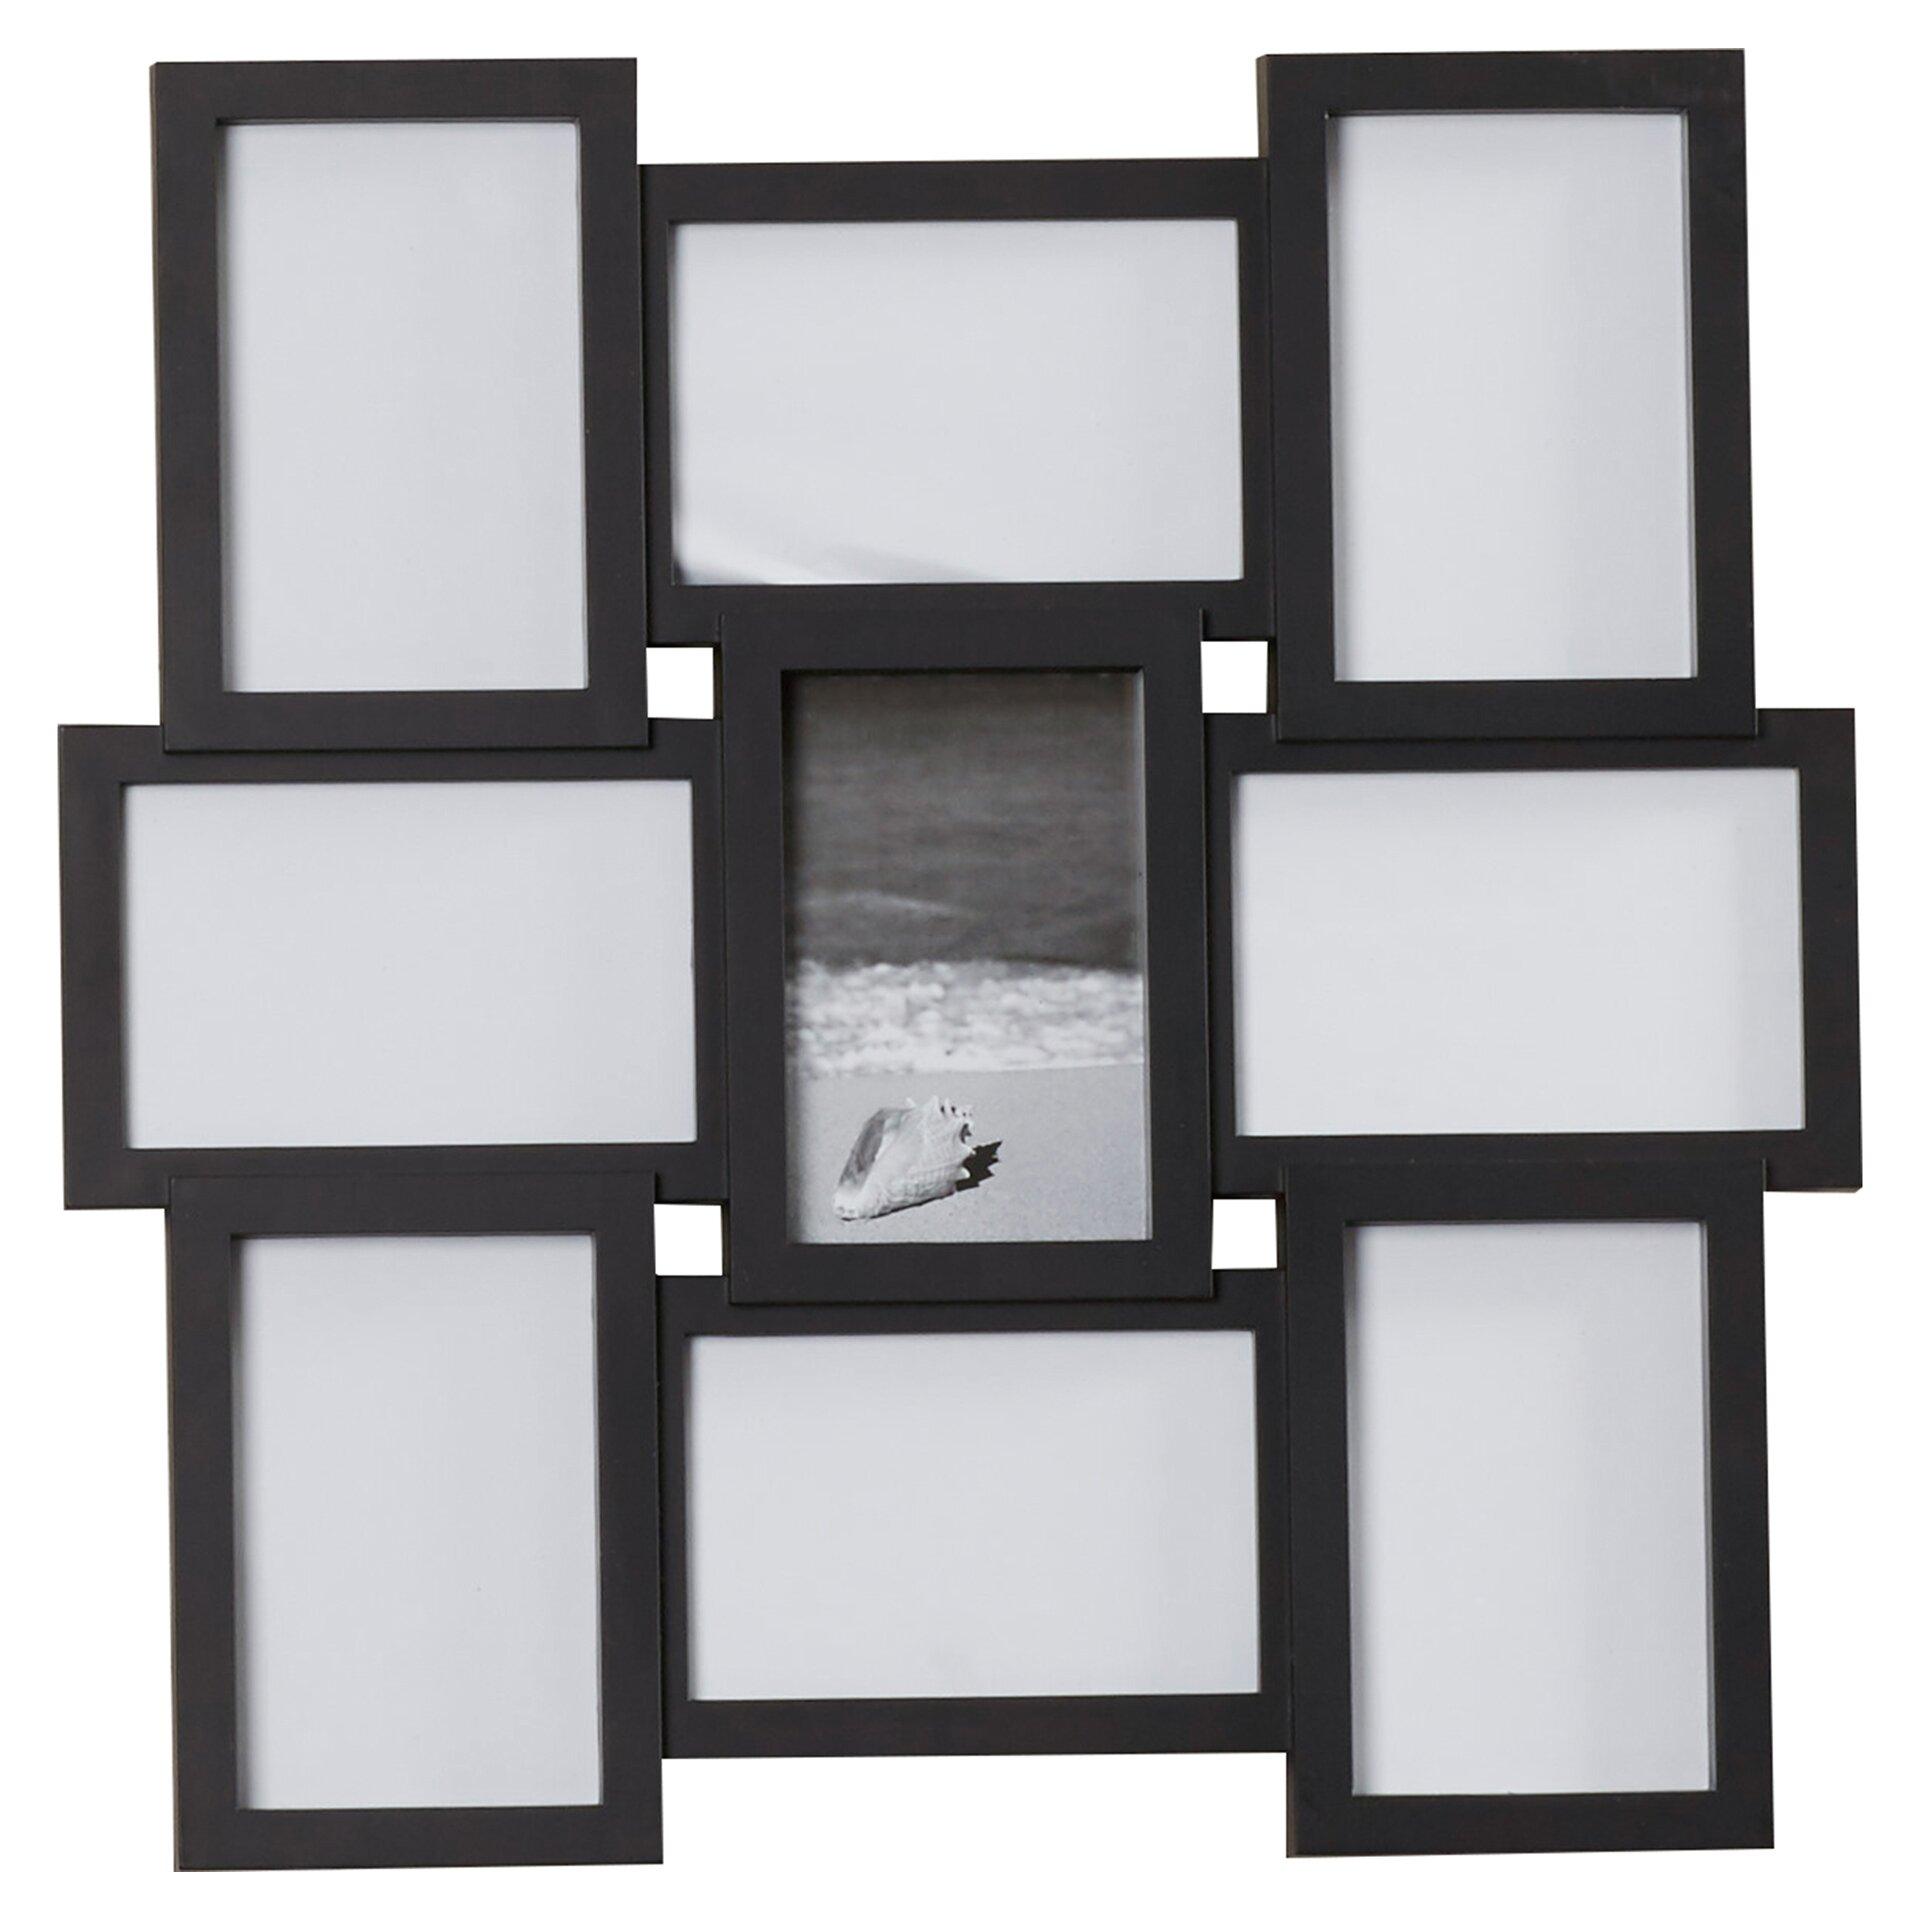 varick gallery brennan 4 x 6 collage picture frame reviews wayfair. Black Bedroom Furniture Sets. Home Design Ideas